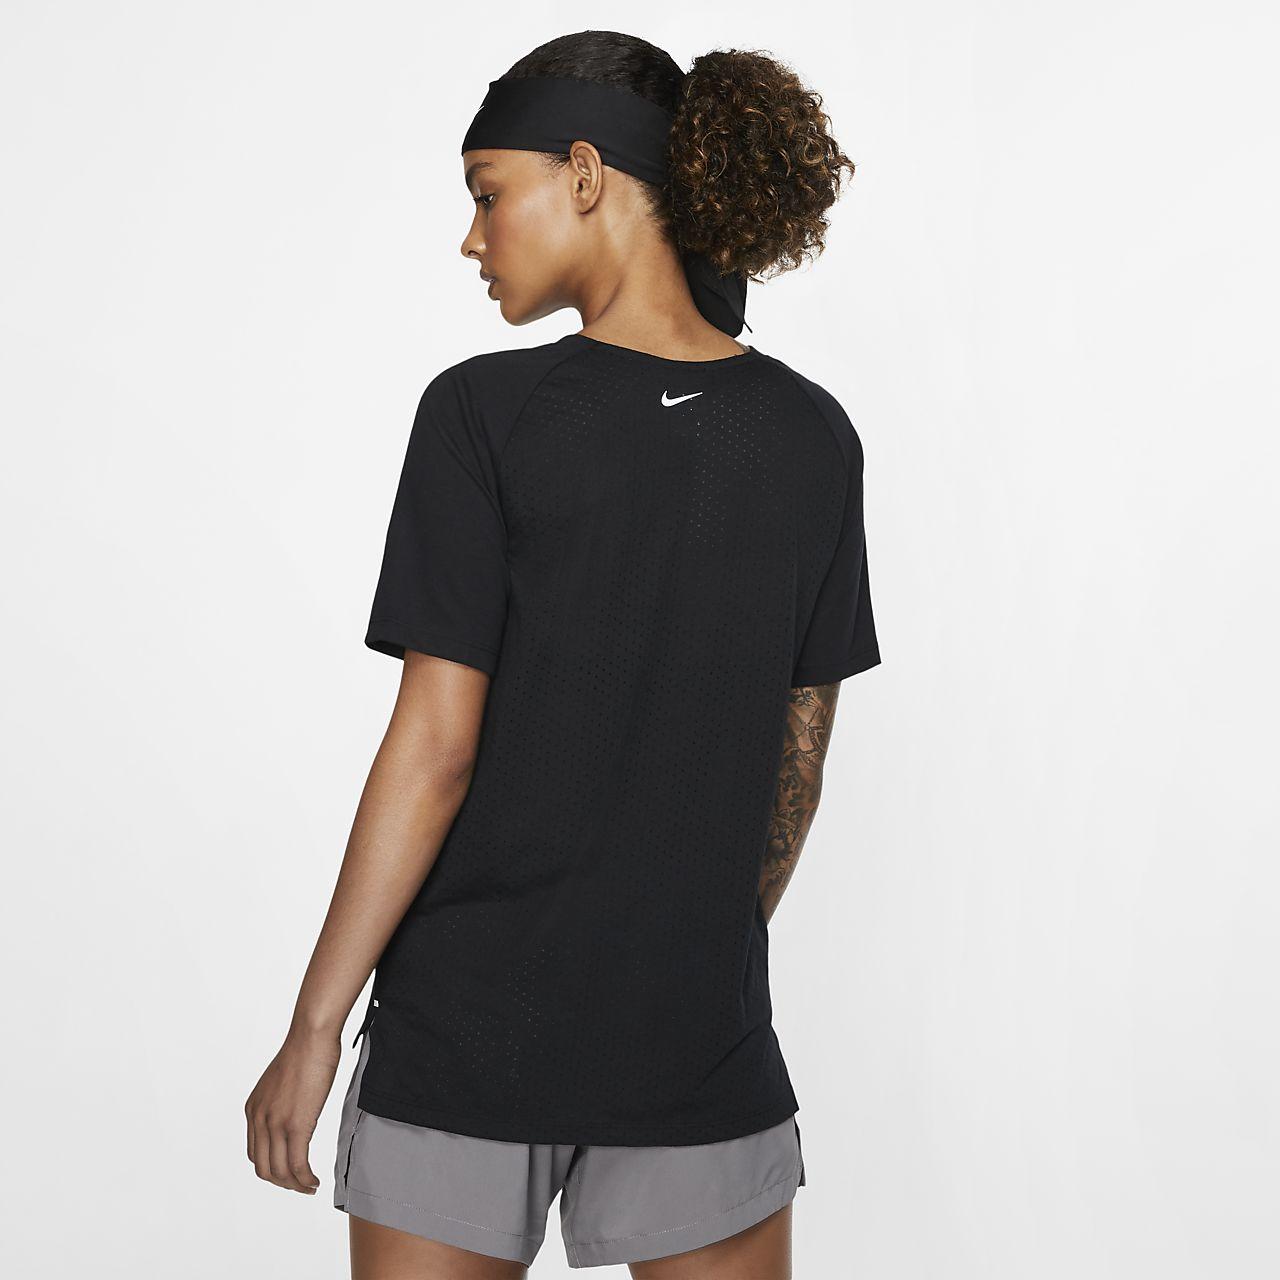 Nike Shortsleeved loose T-shirt Braderie Chaud Meilleur Magasin Pour Obtenir 2018 Nouvelle kizkril5n